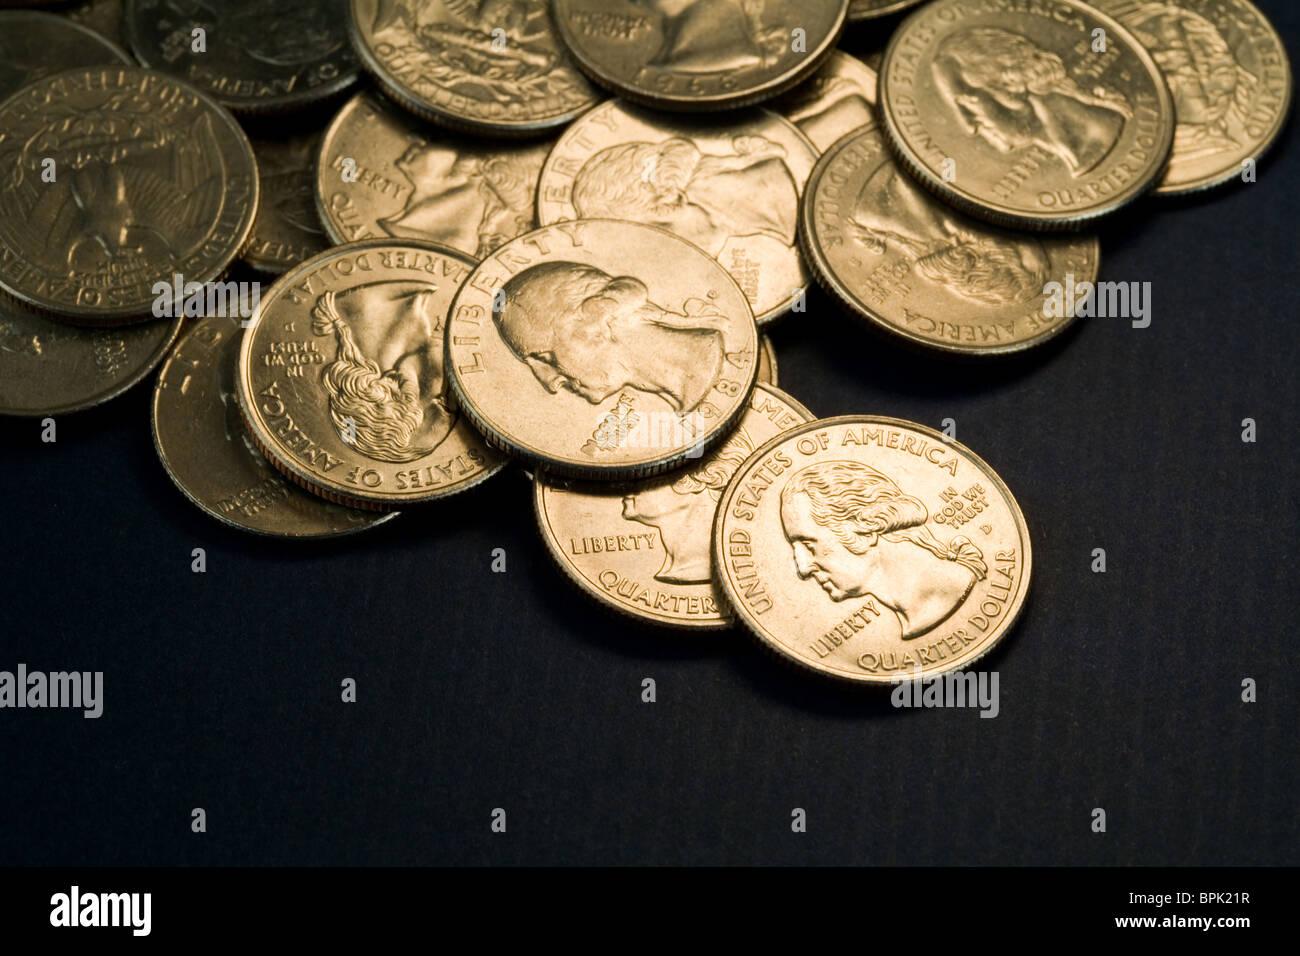 US-Münzen Nahaufnahme Schuss Stockbild